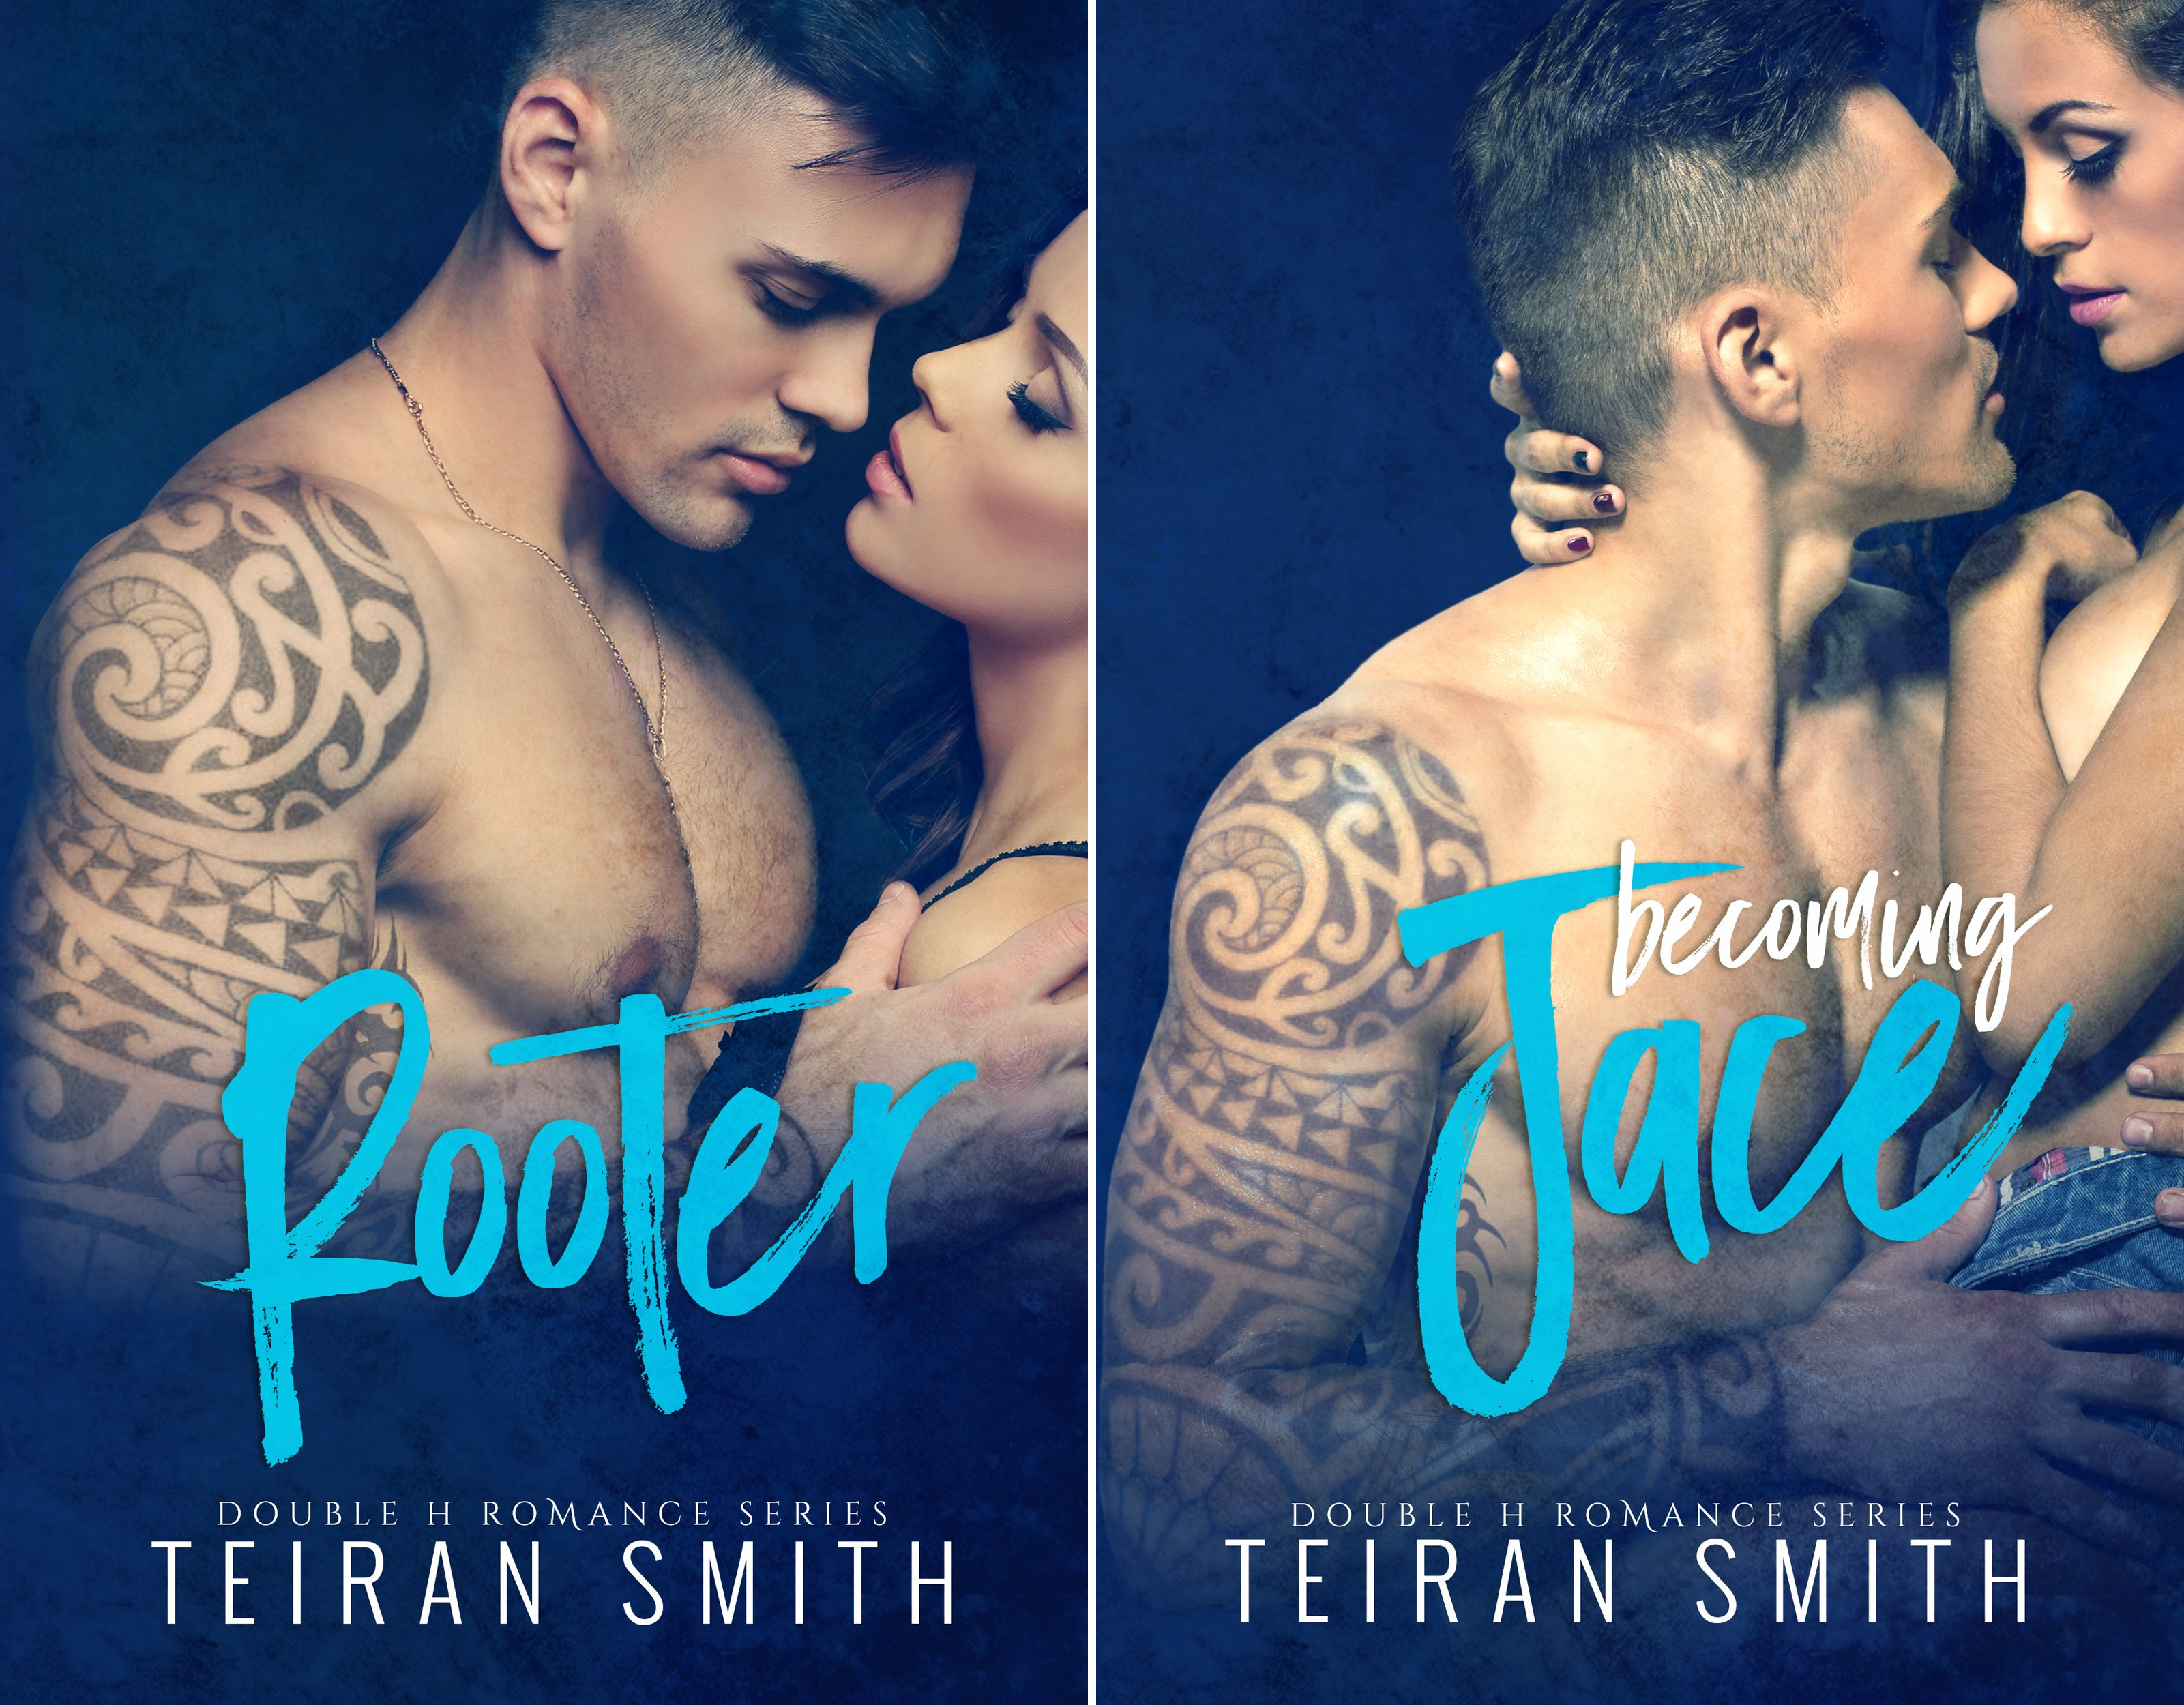 Double H Romance (2 Book Series)